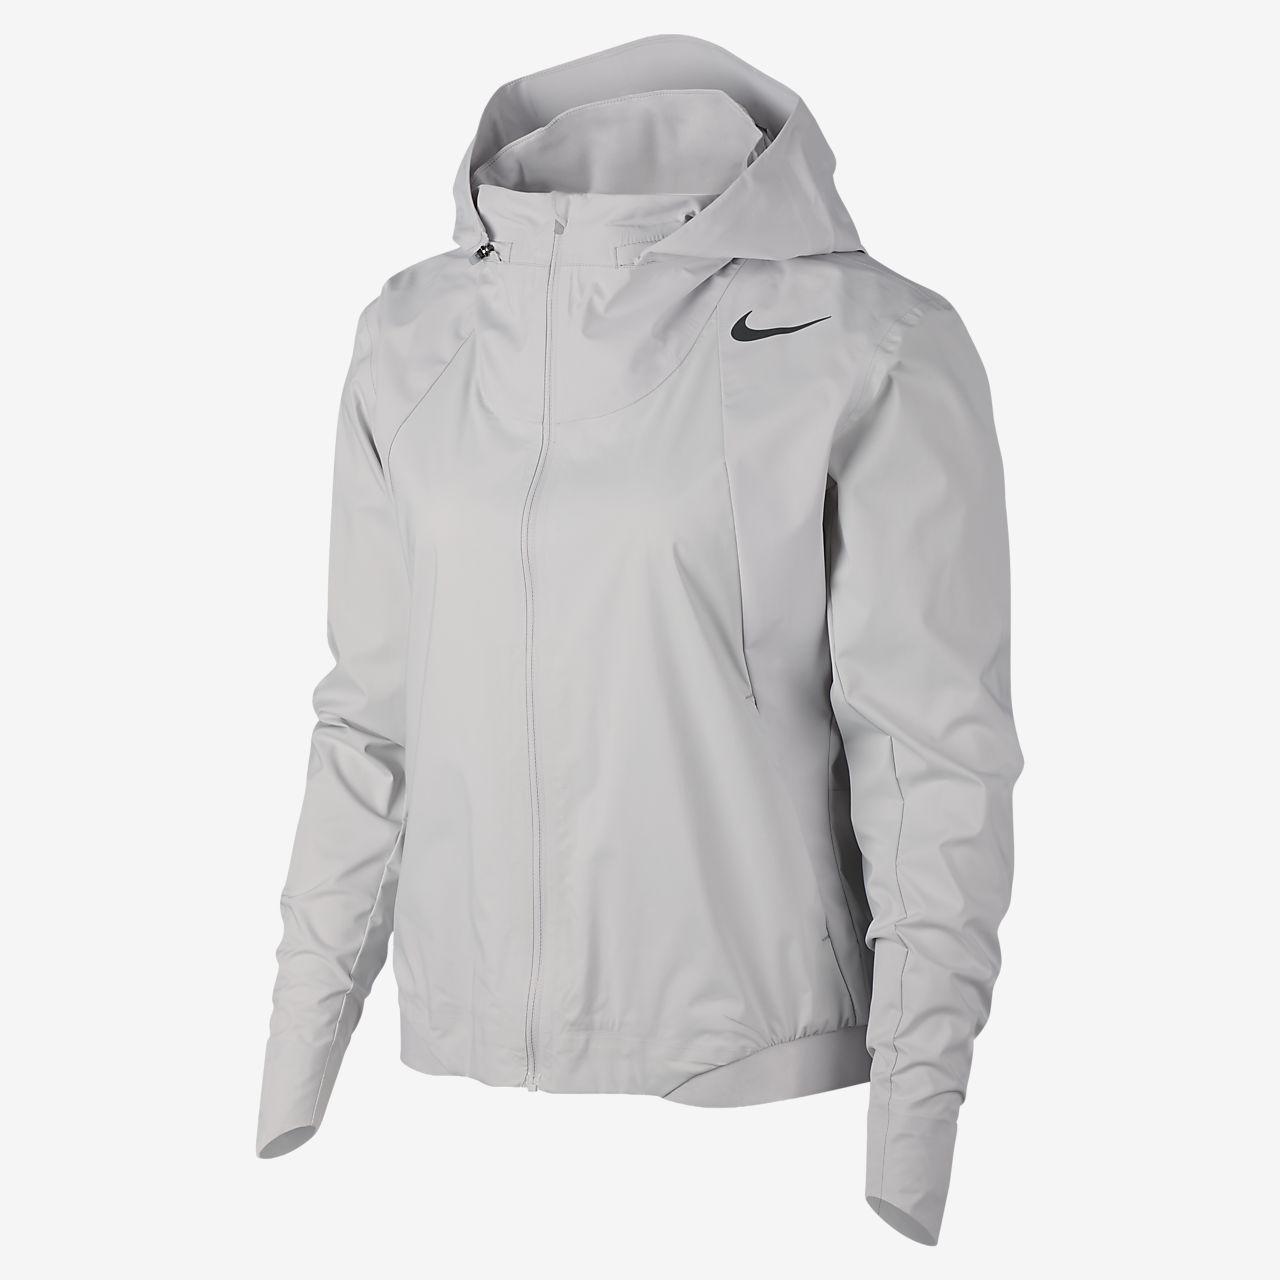 c46b284fc7c0 Nike Zonal AeroShield Women s Running Jacket. Nike.com LU